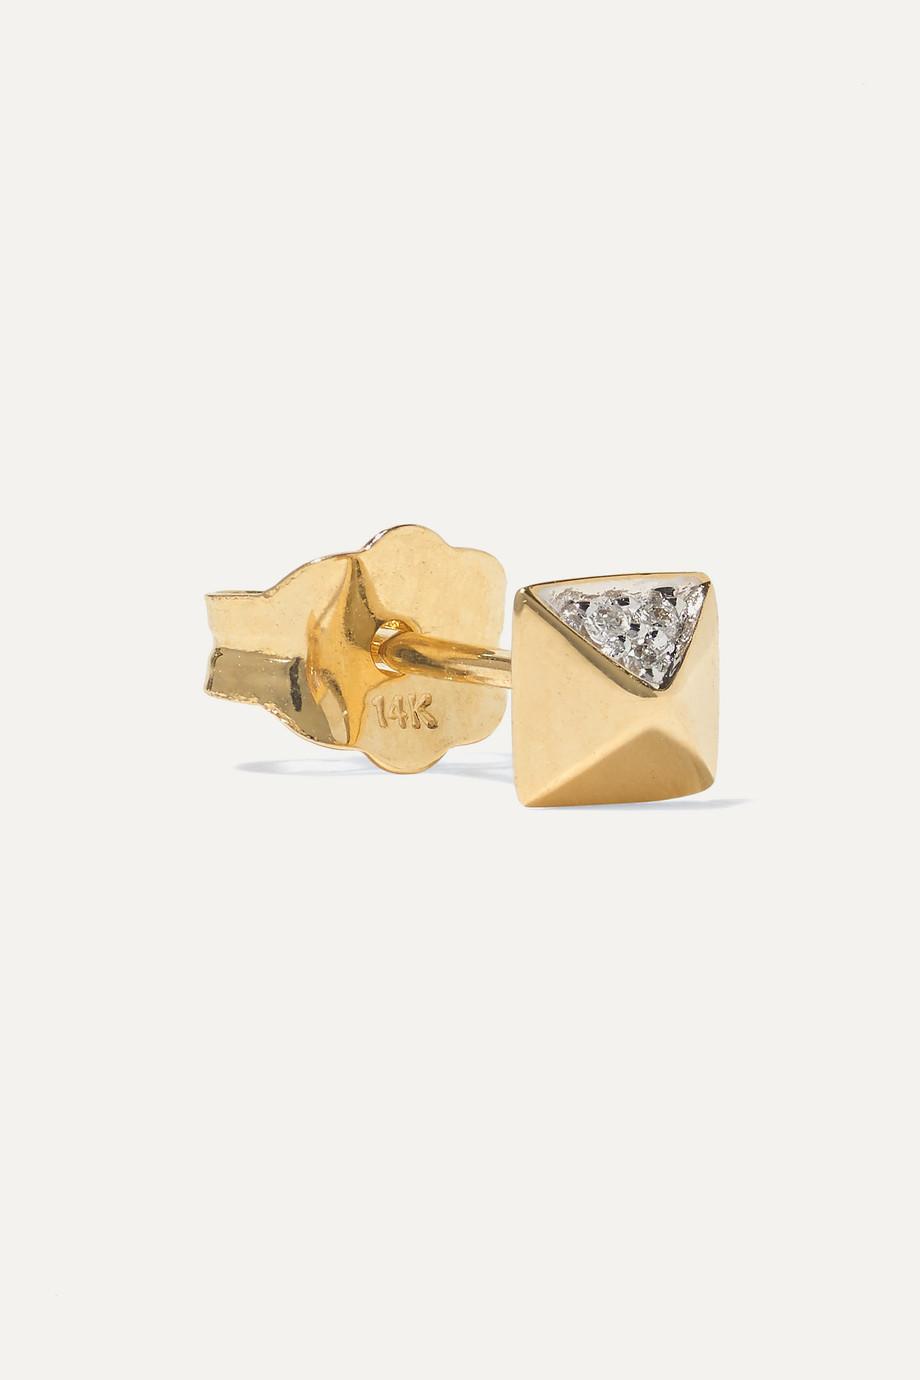 Sydney Evan Mini Pyramid 14-karat gold diamond earrings